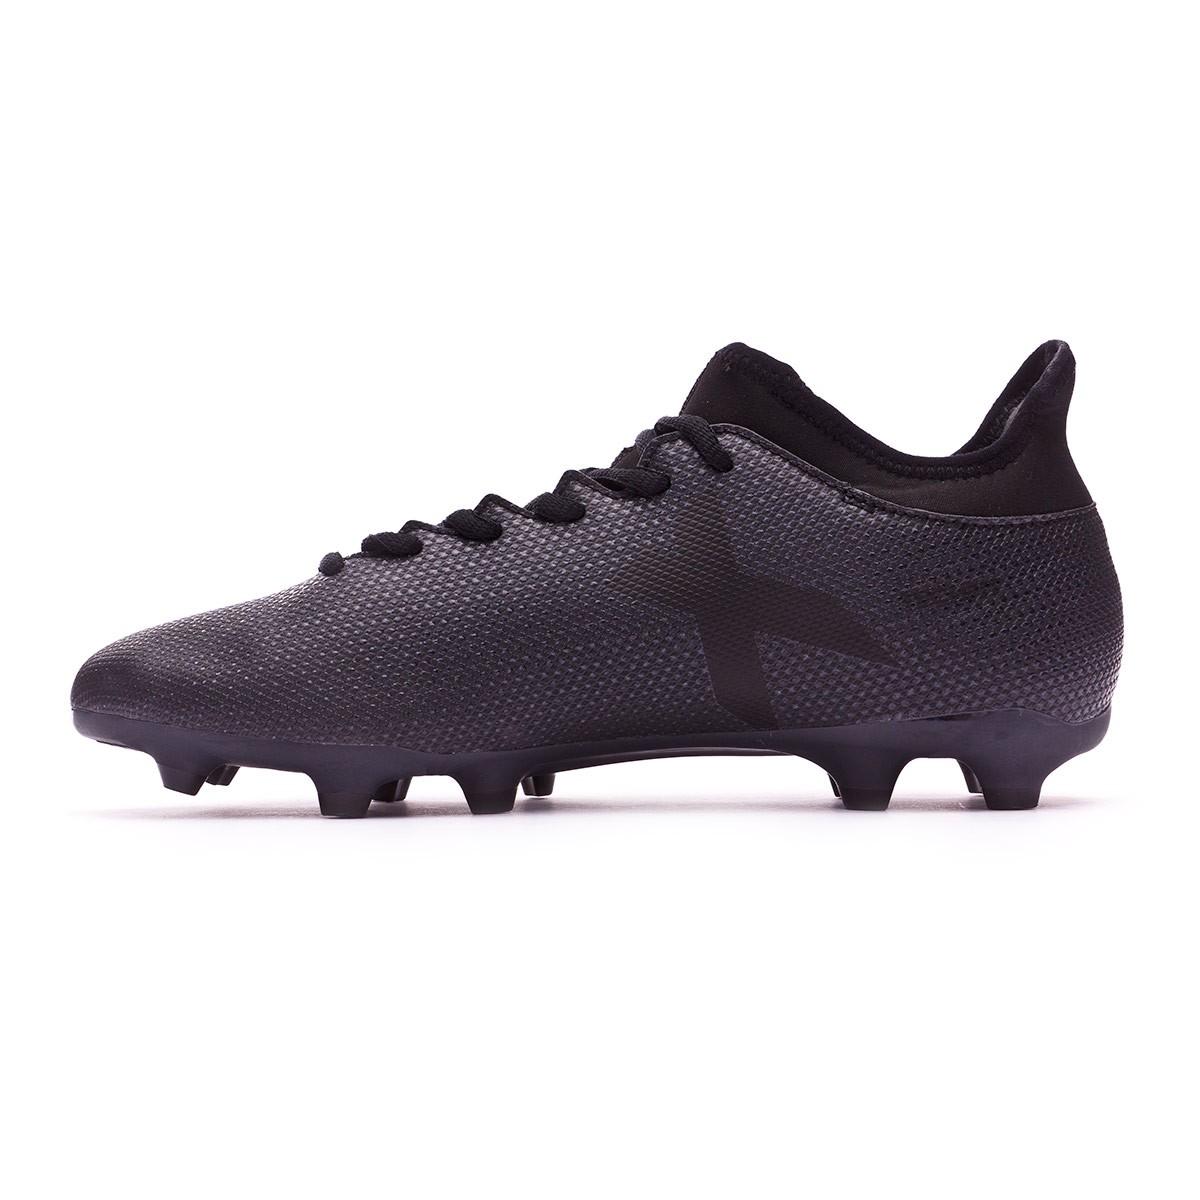 6993509f90 Chuteira adidas X 17.3 FG Core black-Super cyan - Loja de futebol Fútbol  Emotion